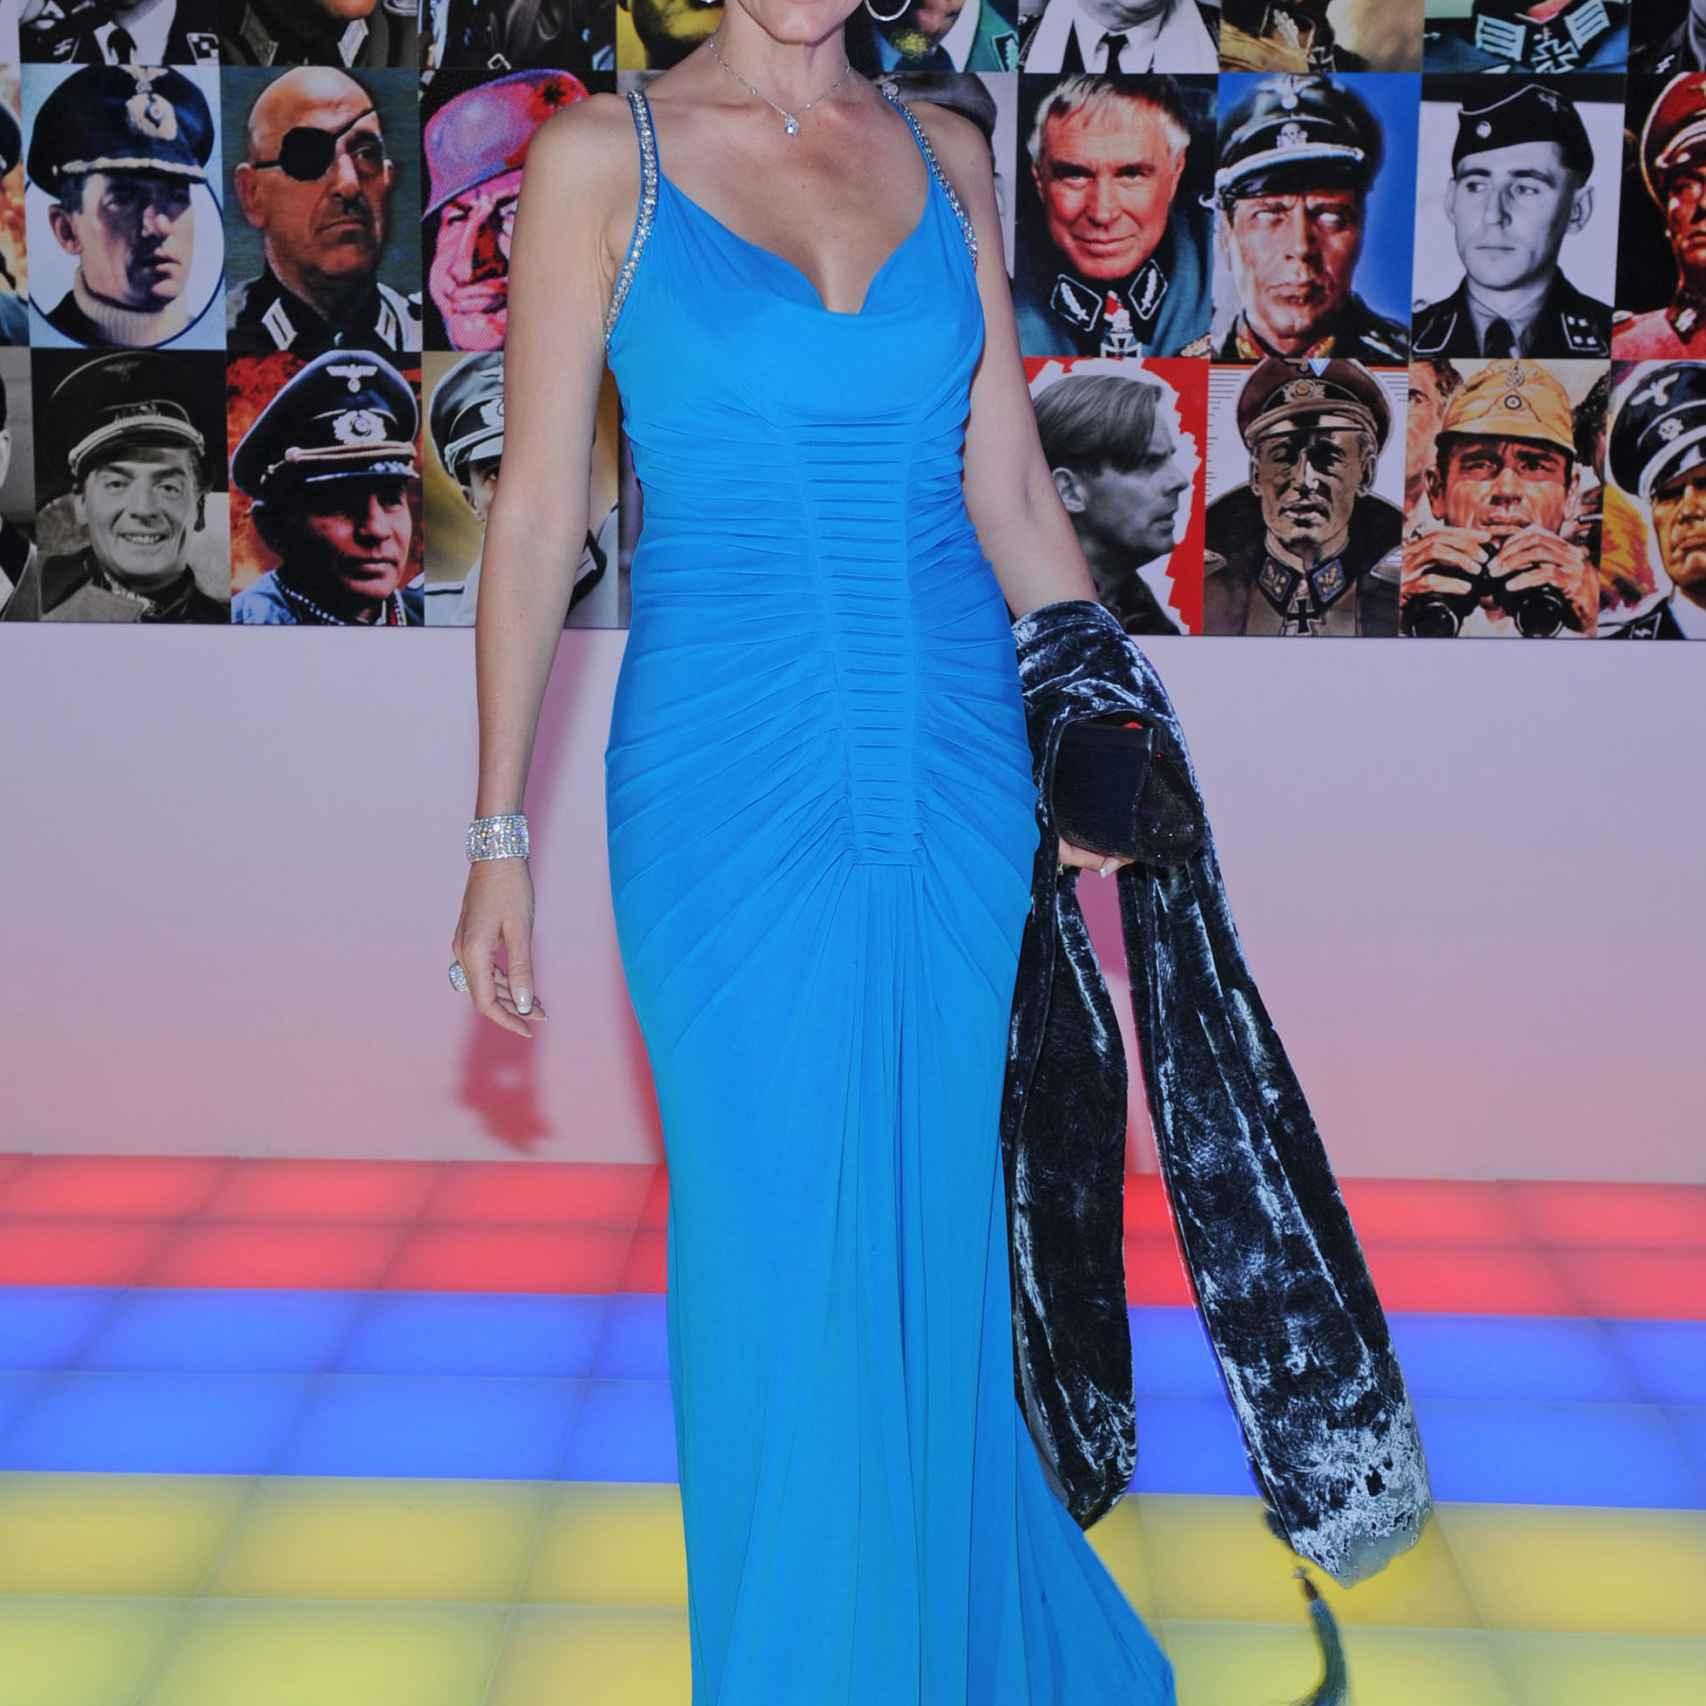 Christina Estrada en una fiesta en Venecia.